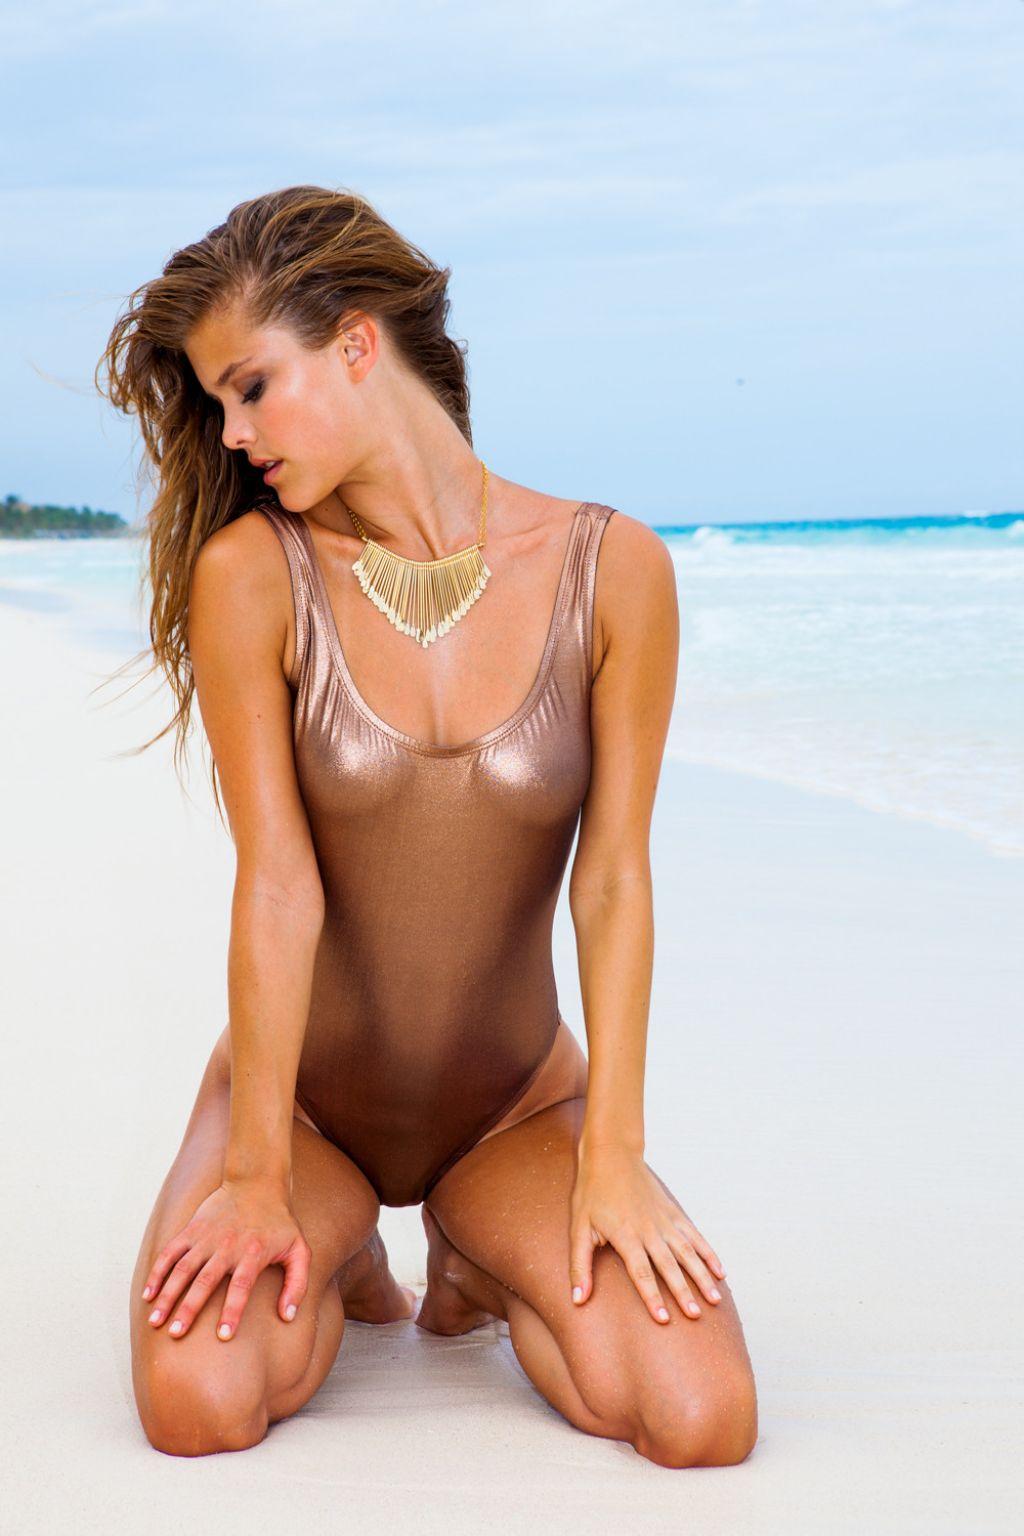 Petite Skimpy Girls Wallpapers Nina Agdal In A Bikini Sauvage Swimwear 2014 19 High